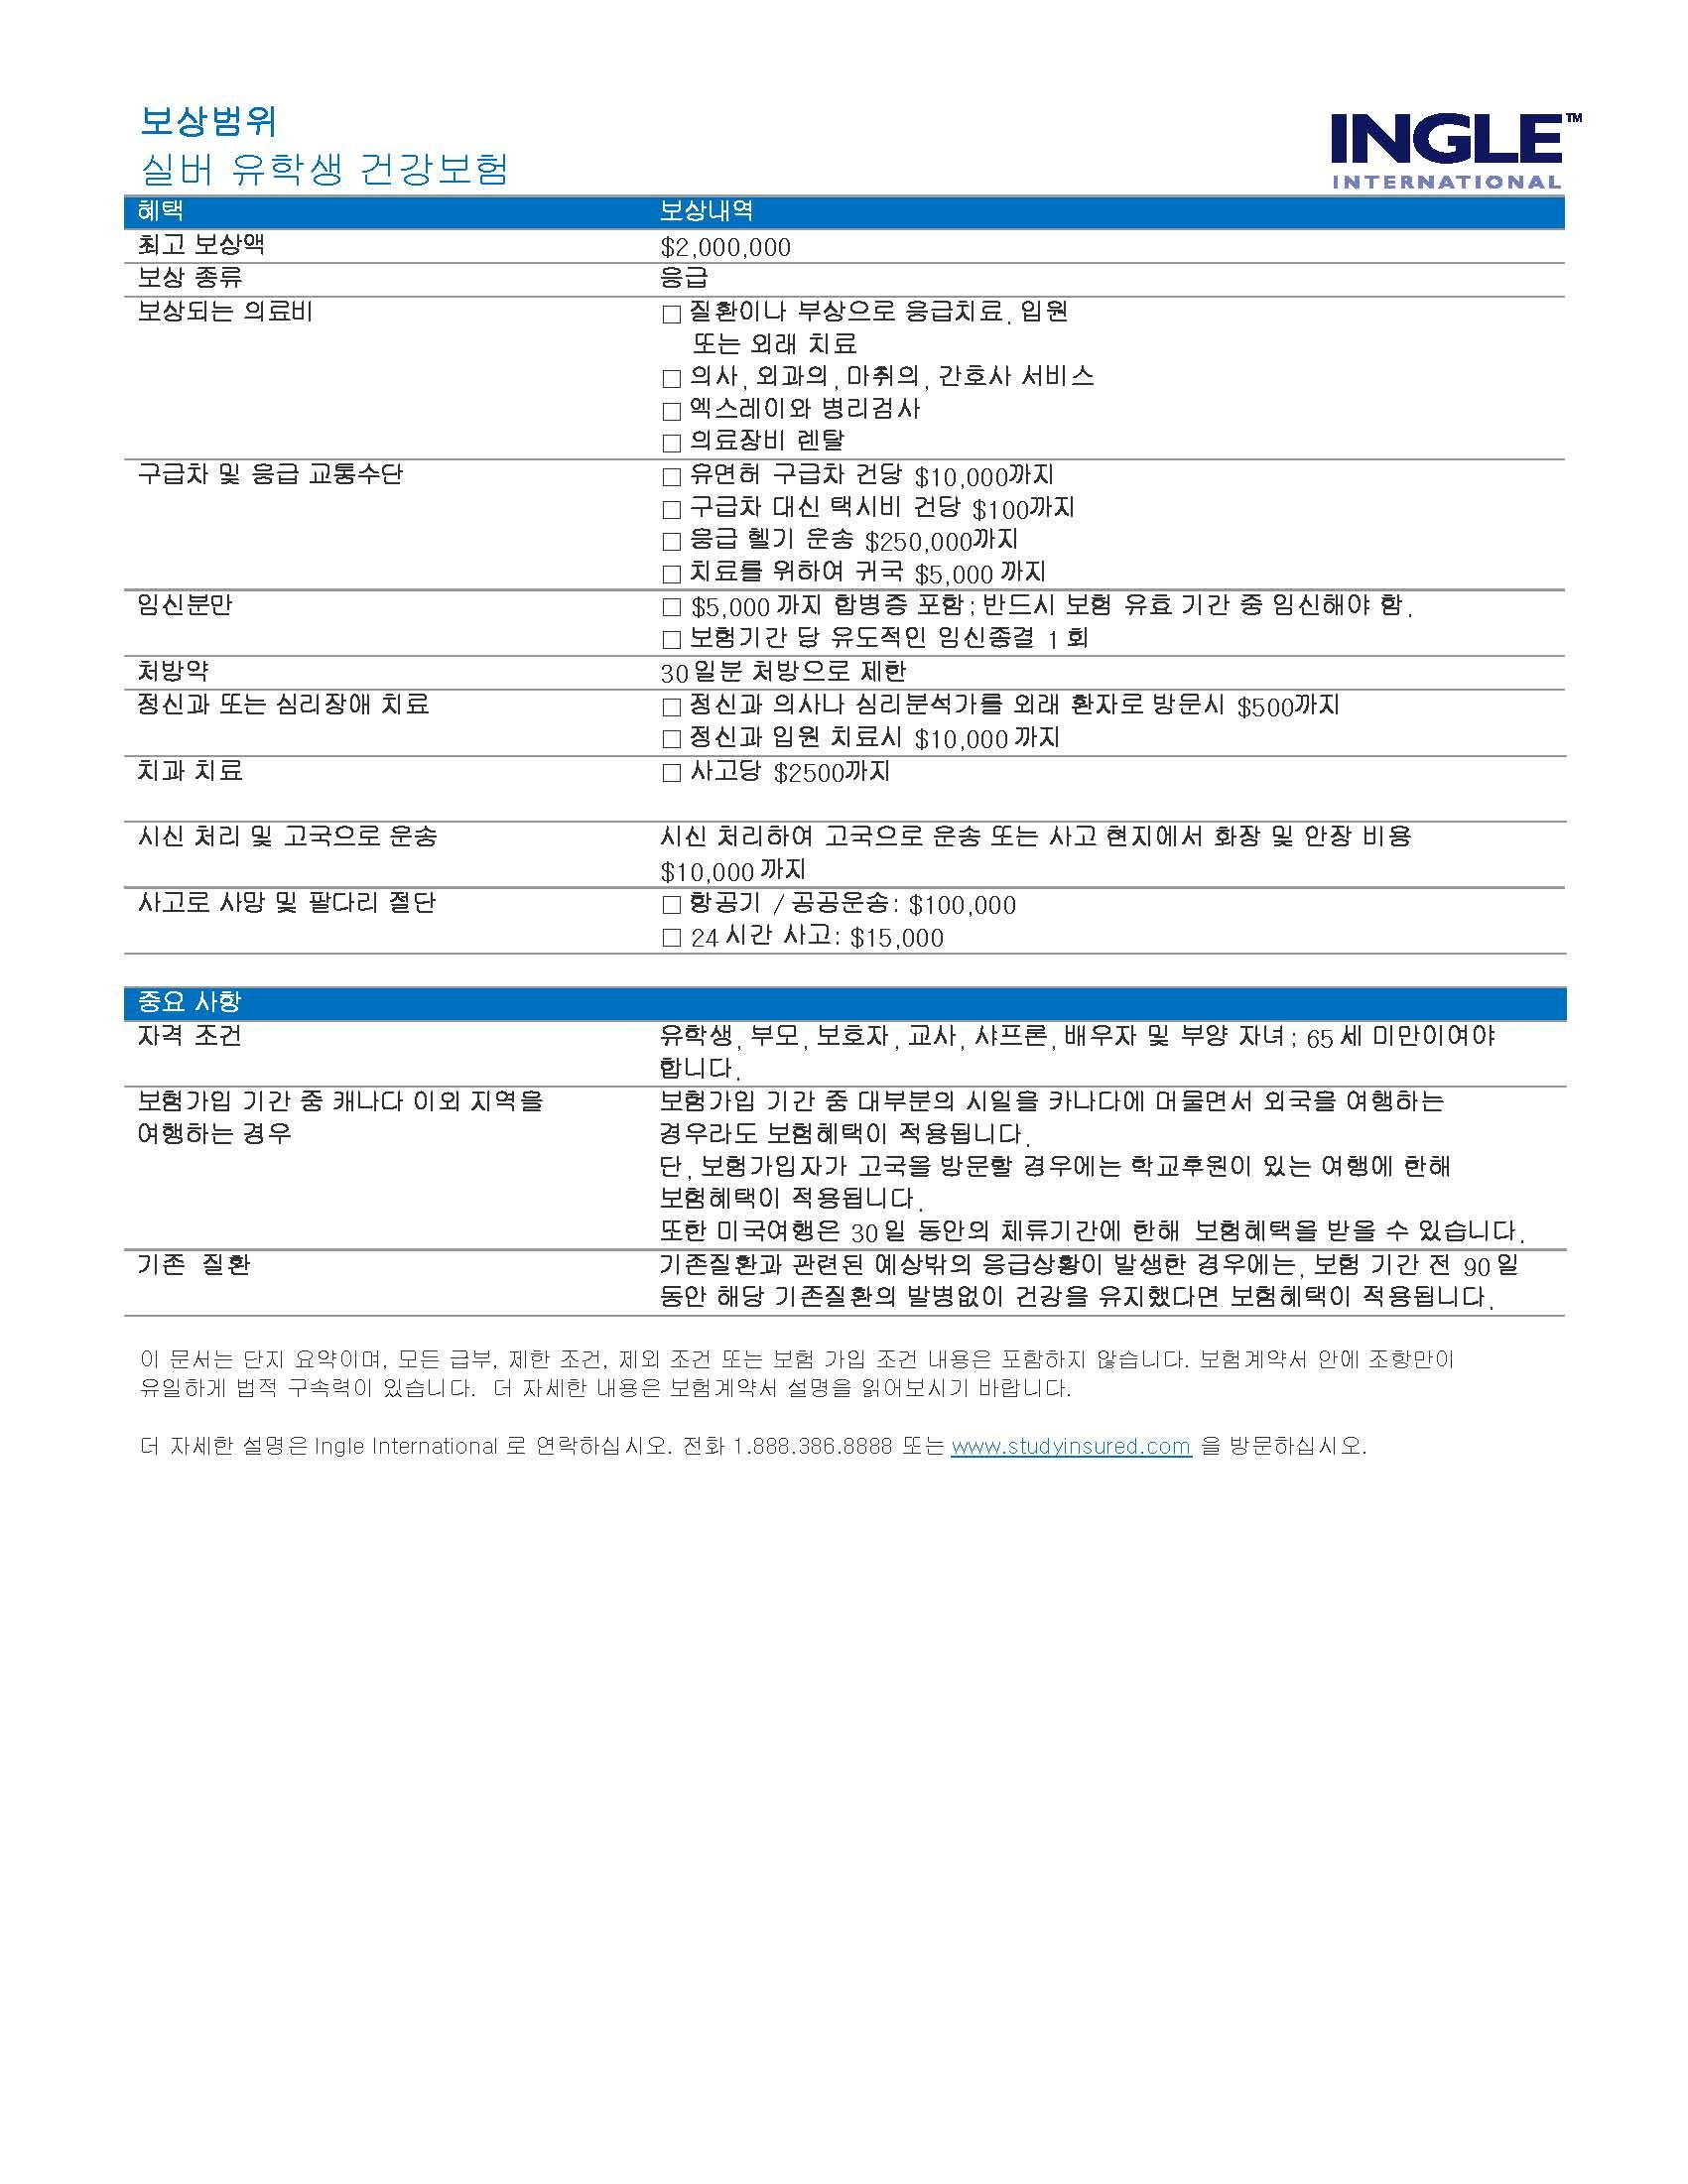 silver_korean.jpg